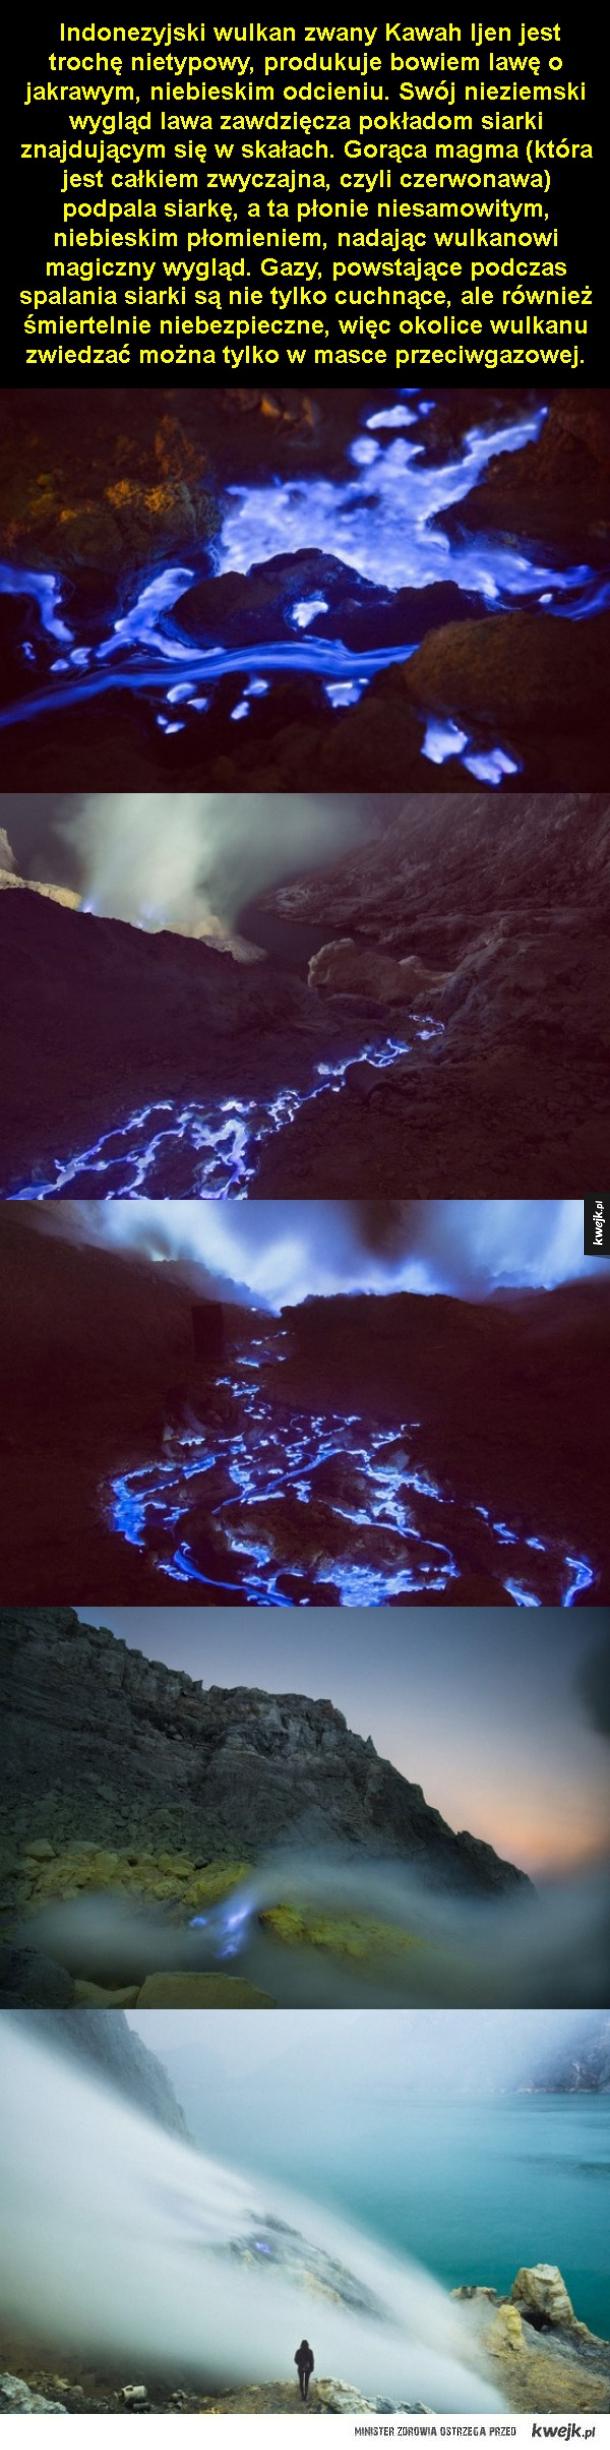 Nietypowy wulkan